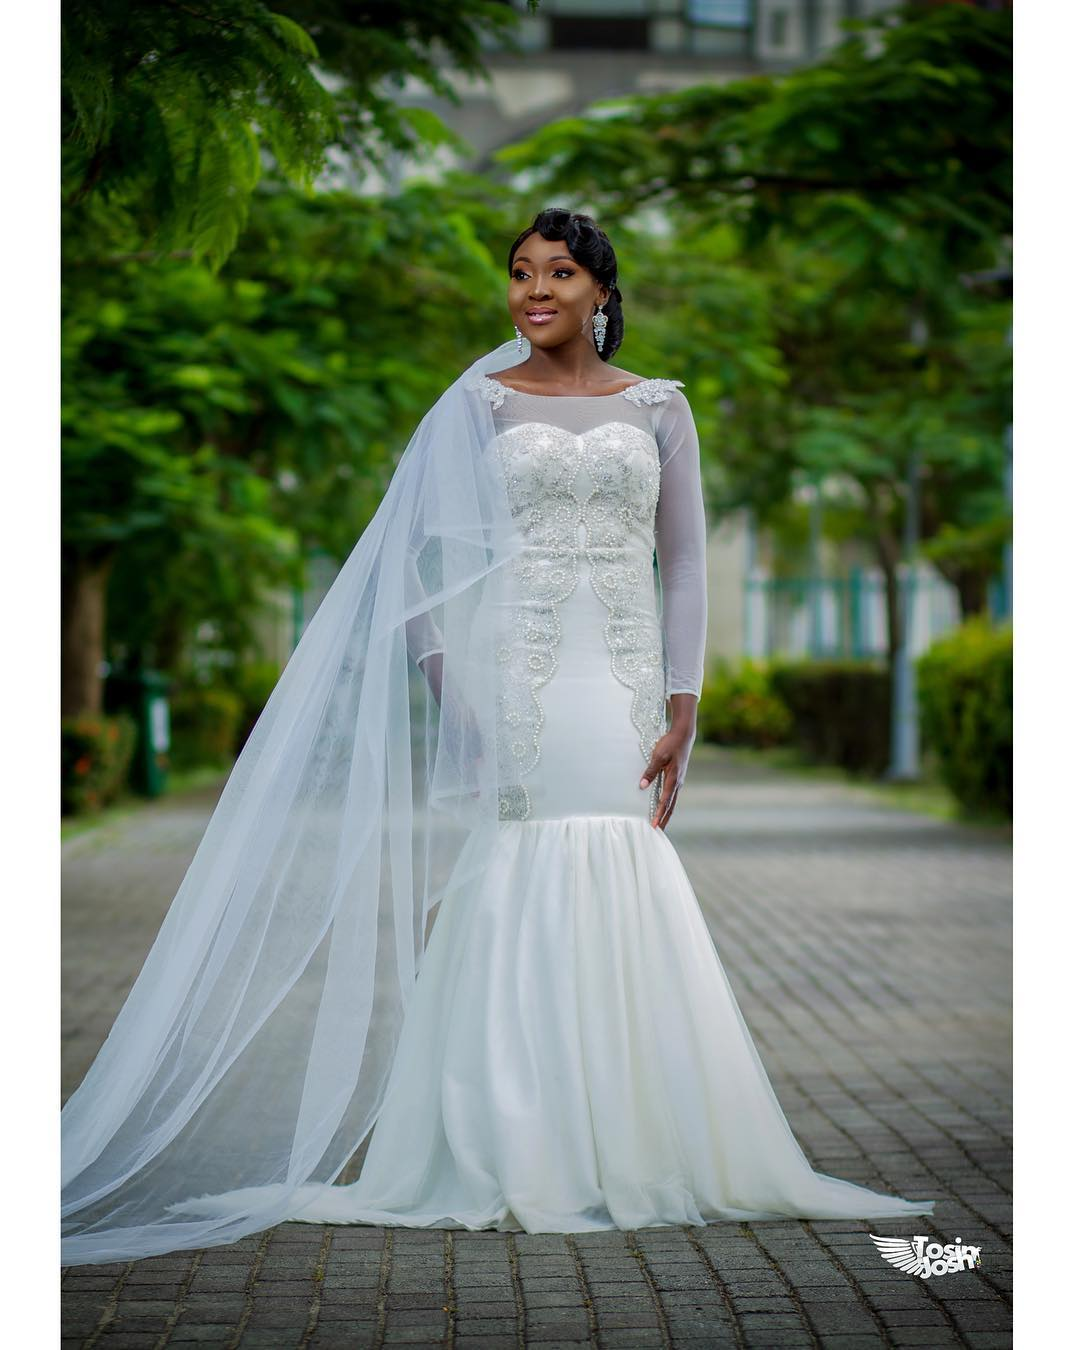 Simple, Elegant Wedding Gowns For 21st Century Brides | A Million ...